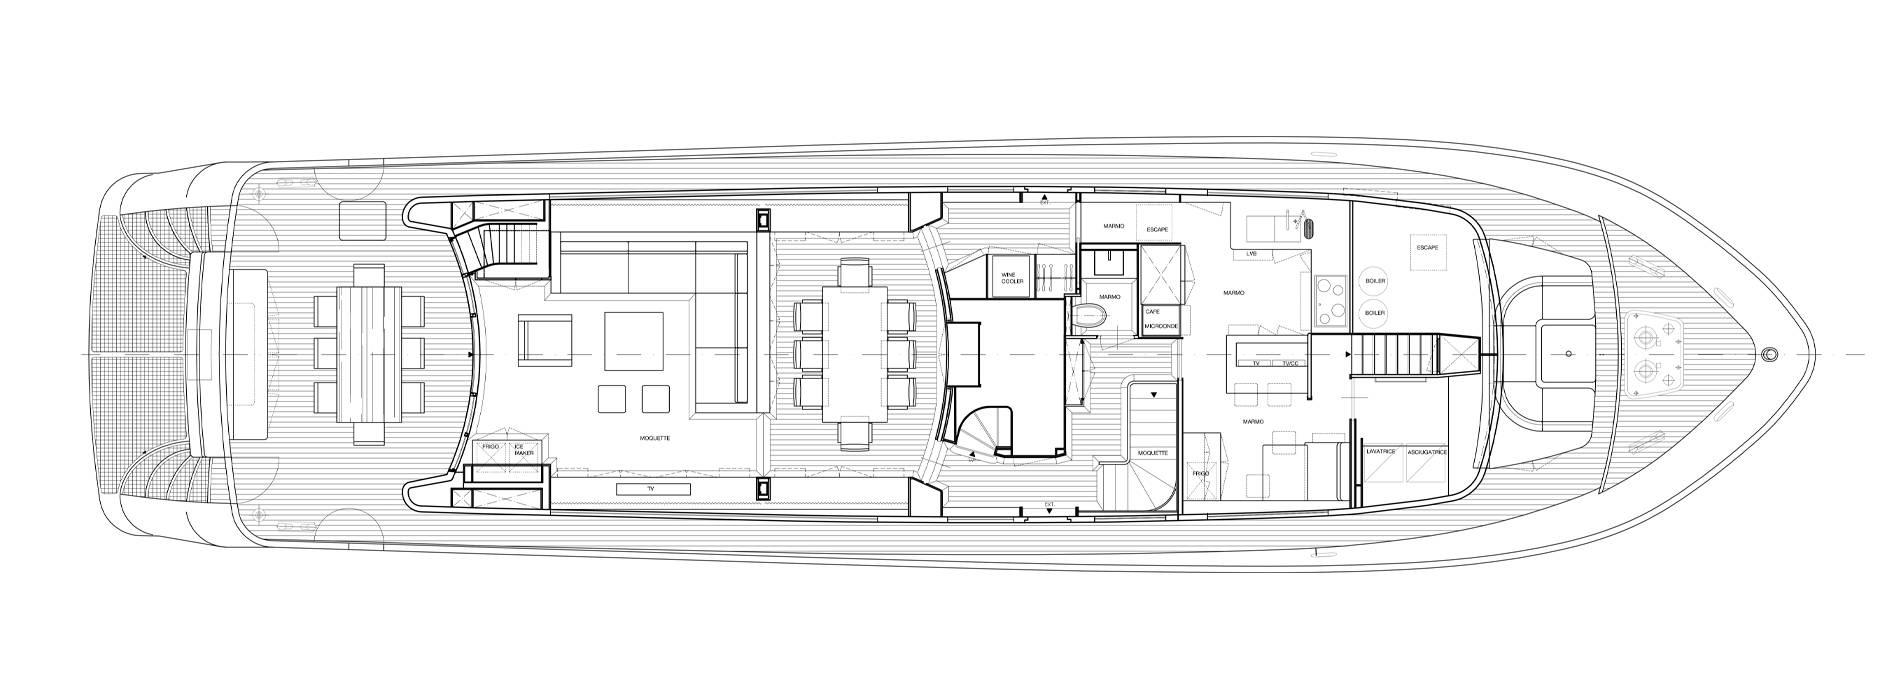 Sanlorenzo Yachts SL88-541 Cubierta principal